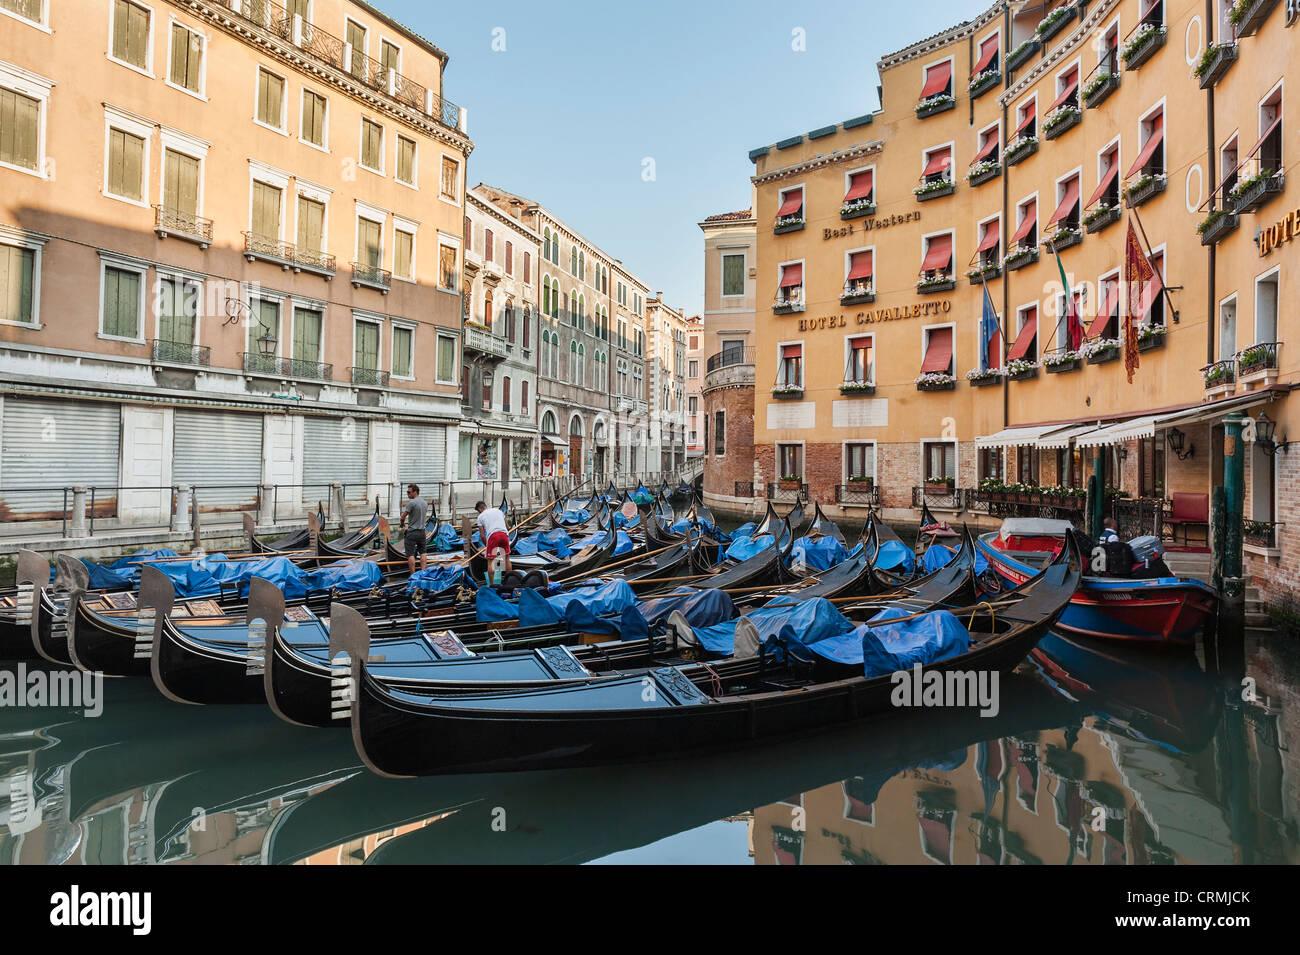 Gondola moorings in Bacino Orseolo Venice. - Stock Image